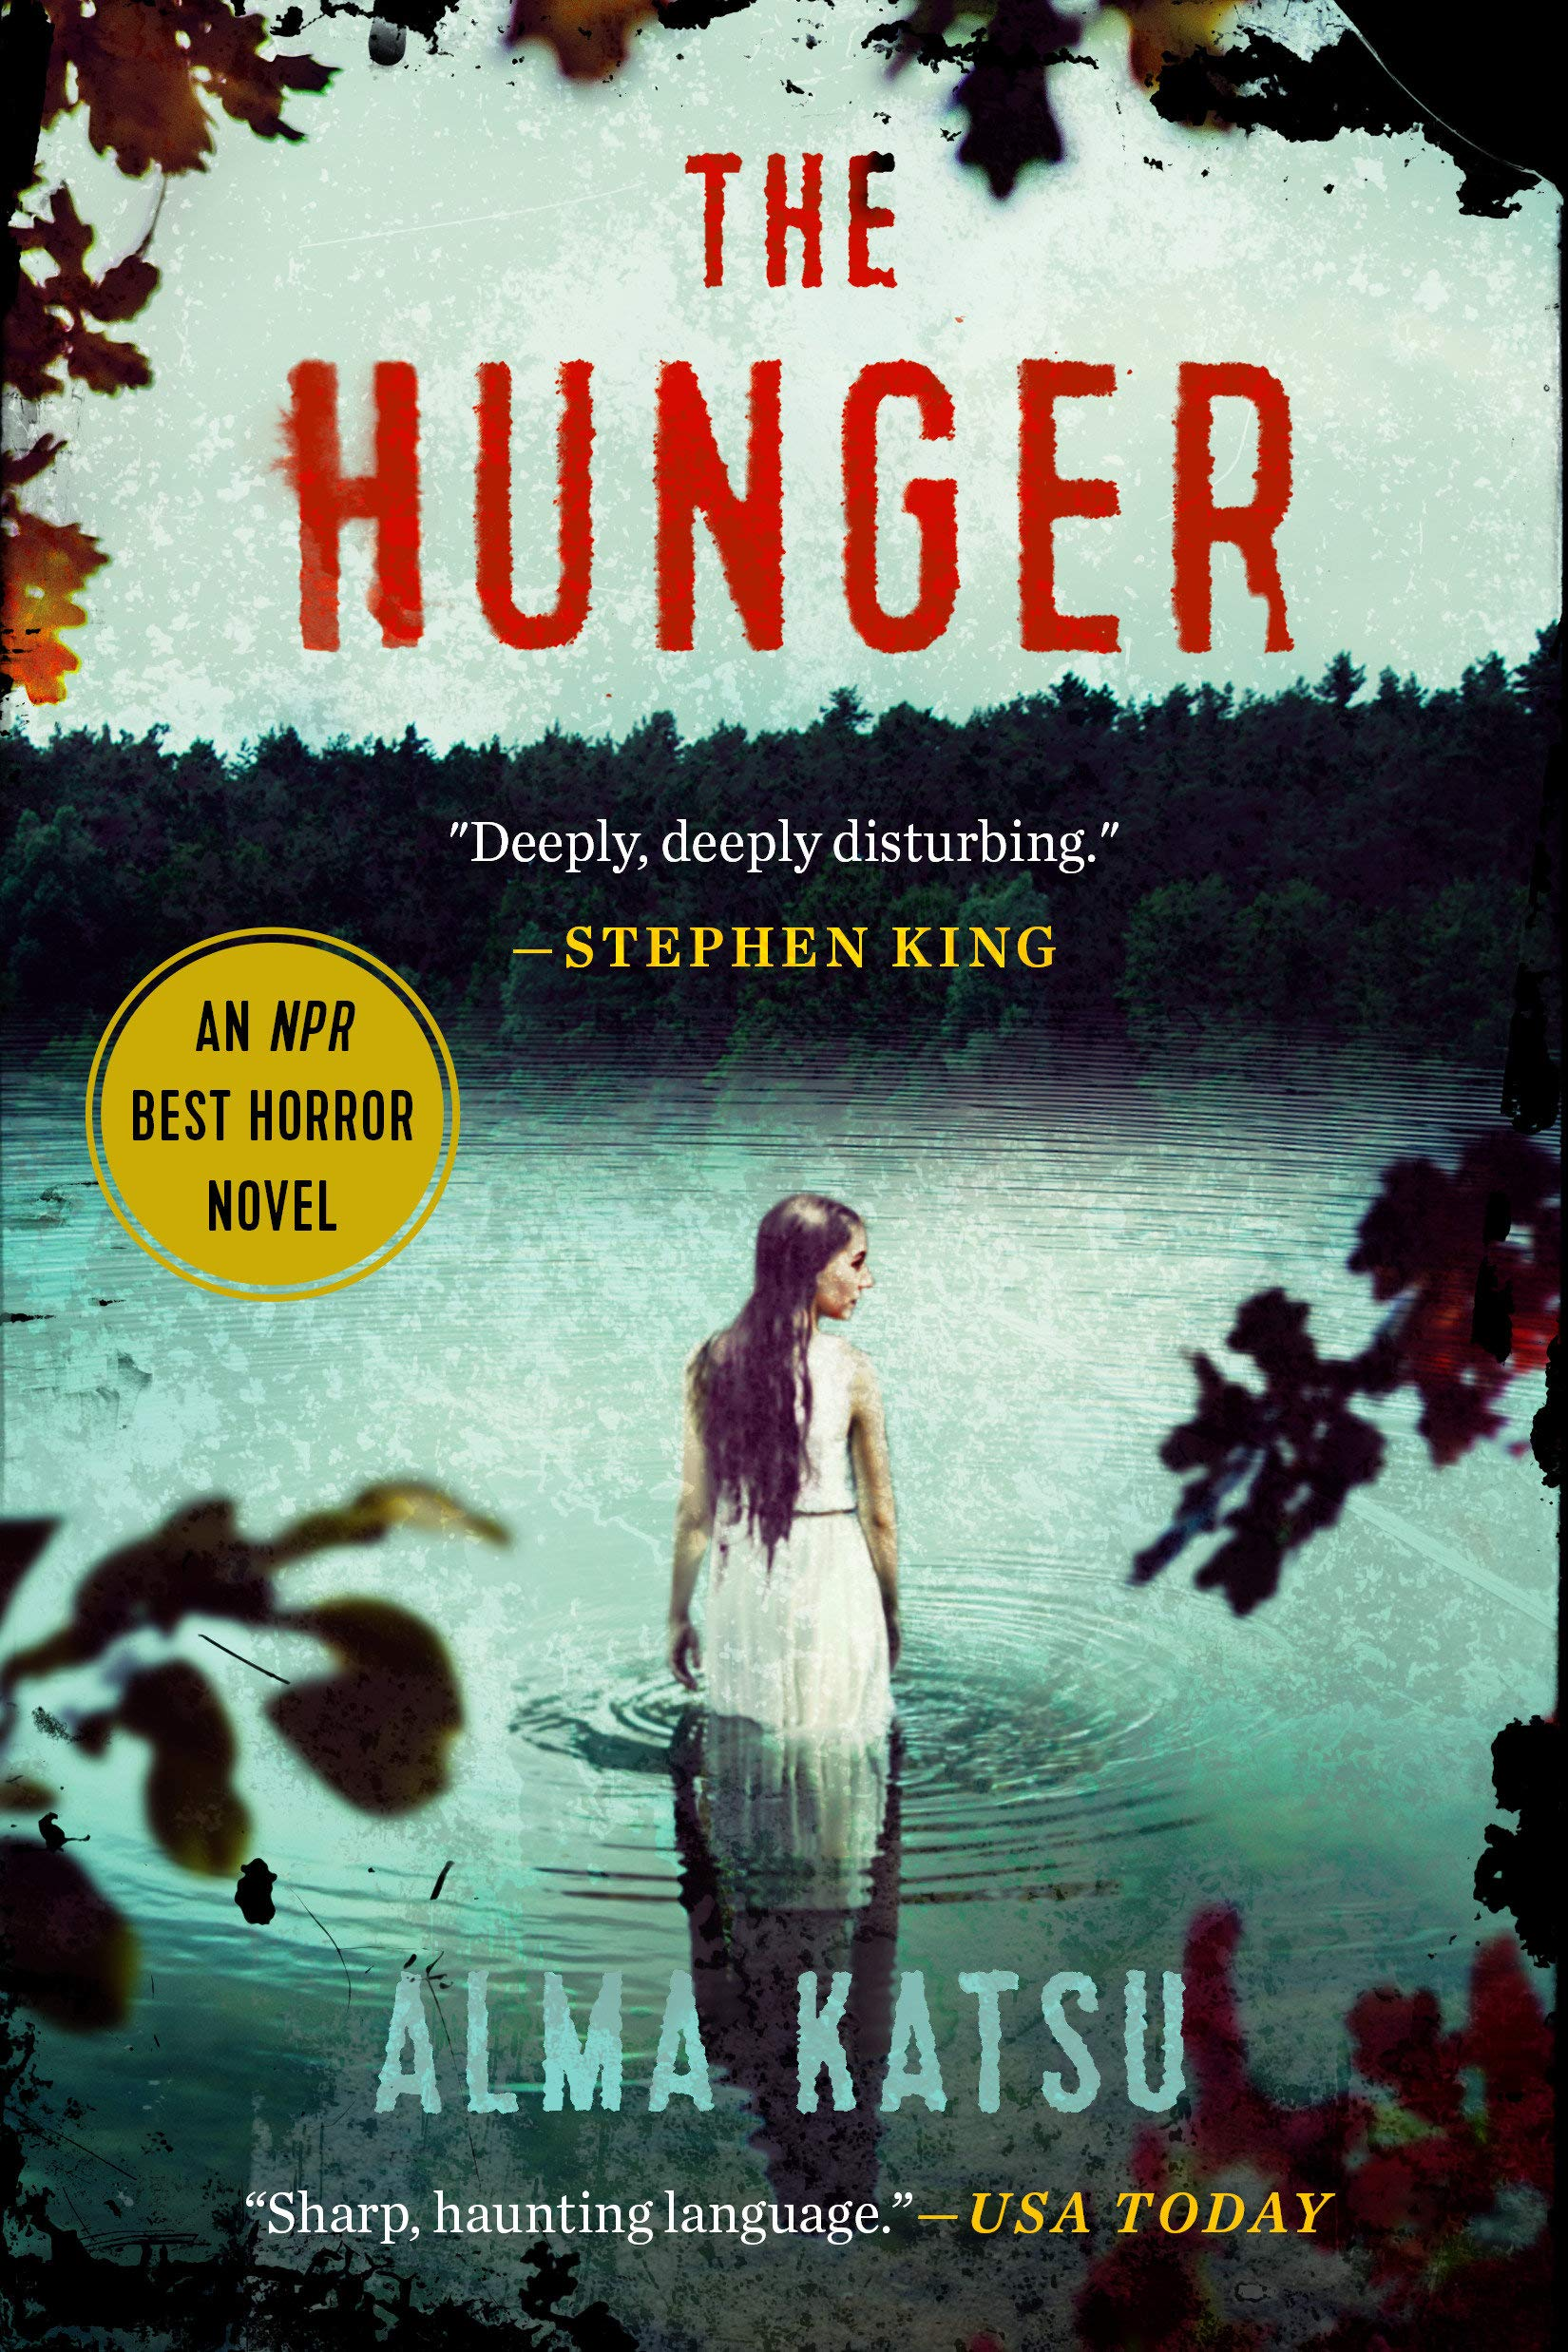 Amazon.com: The Hunger (9780735212534): Katsu, Alma: Books